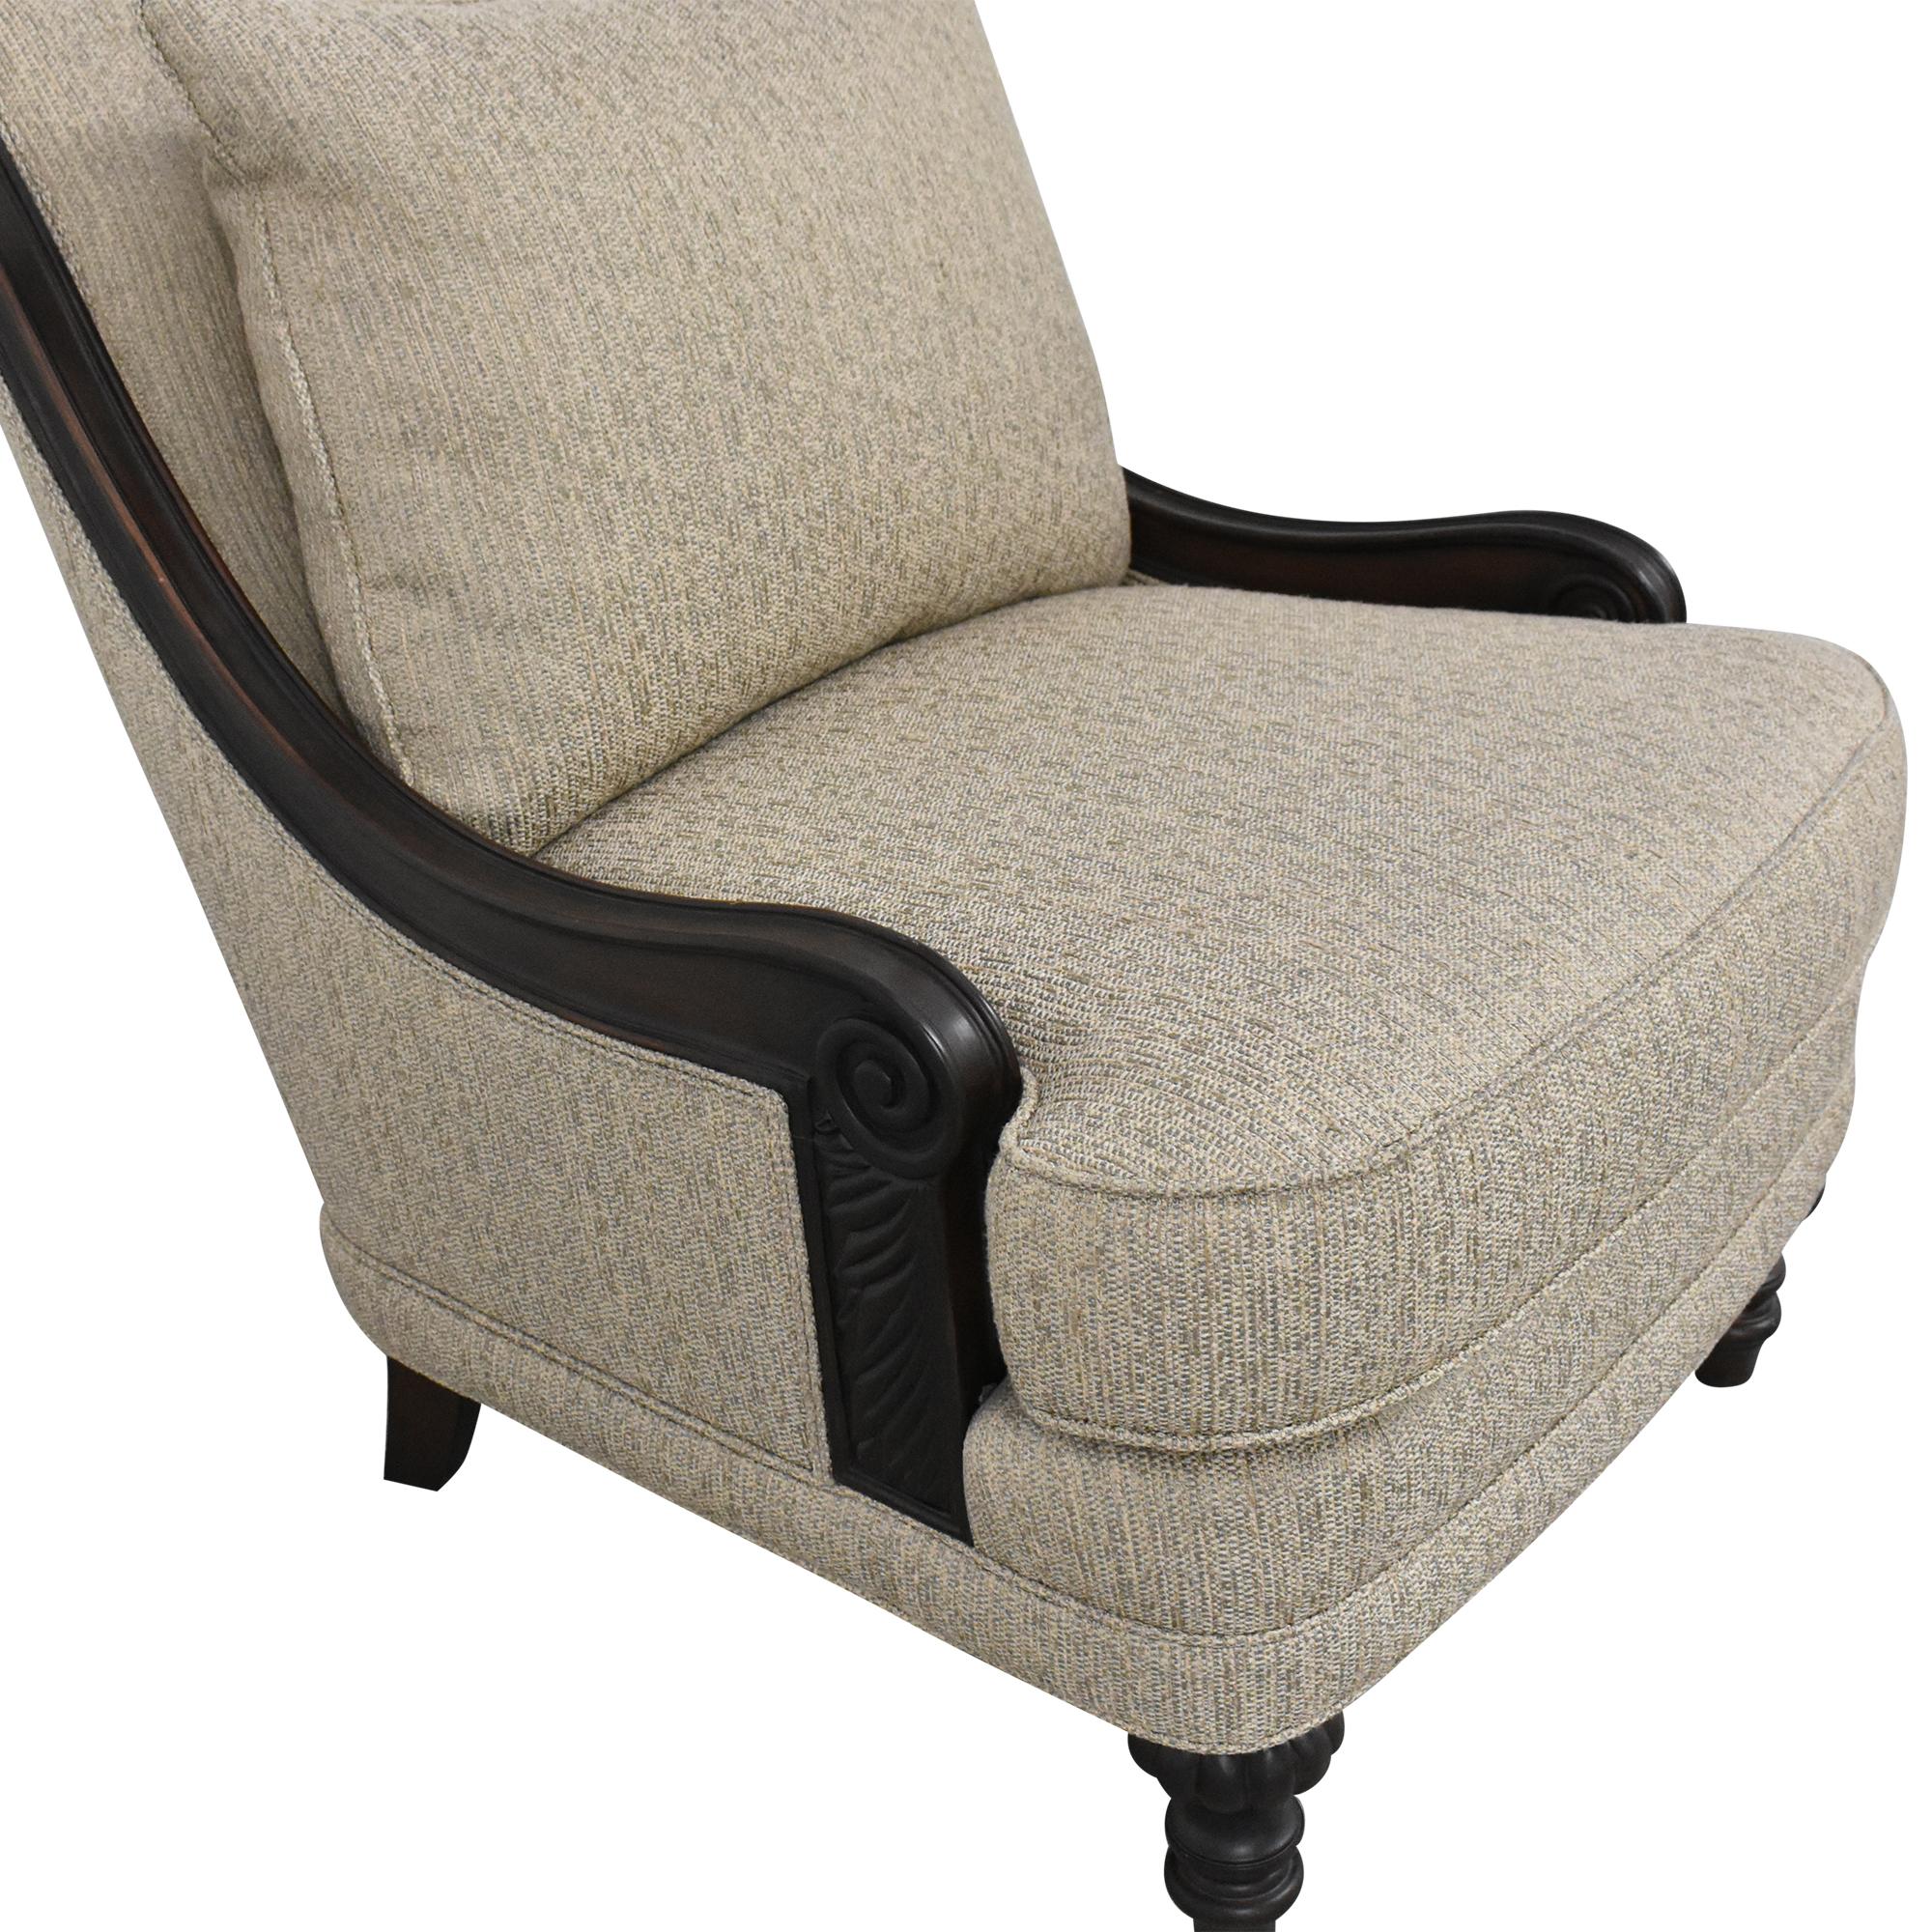 Drexel Heritage Drexel Heritage Basilia Chair used